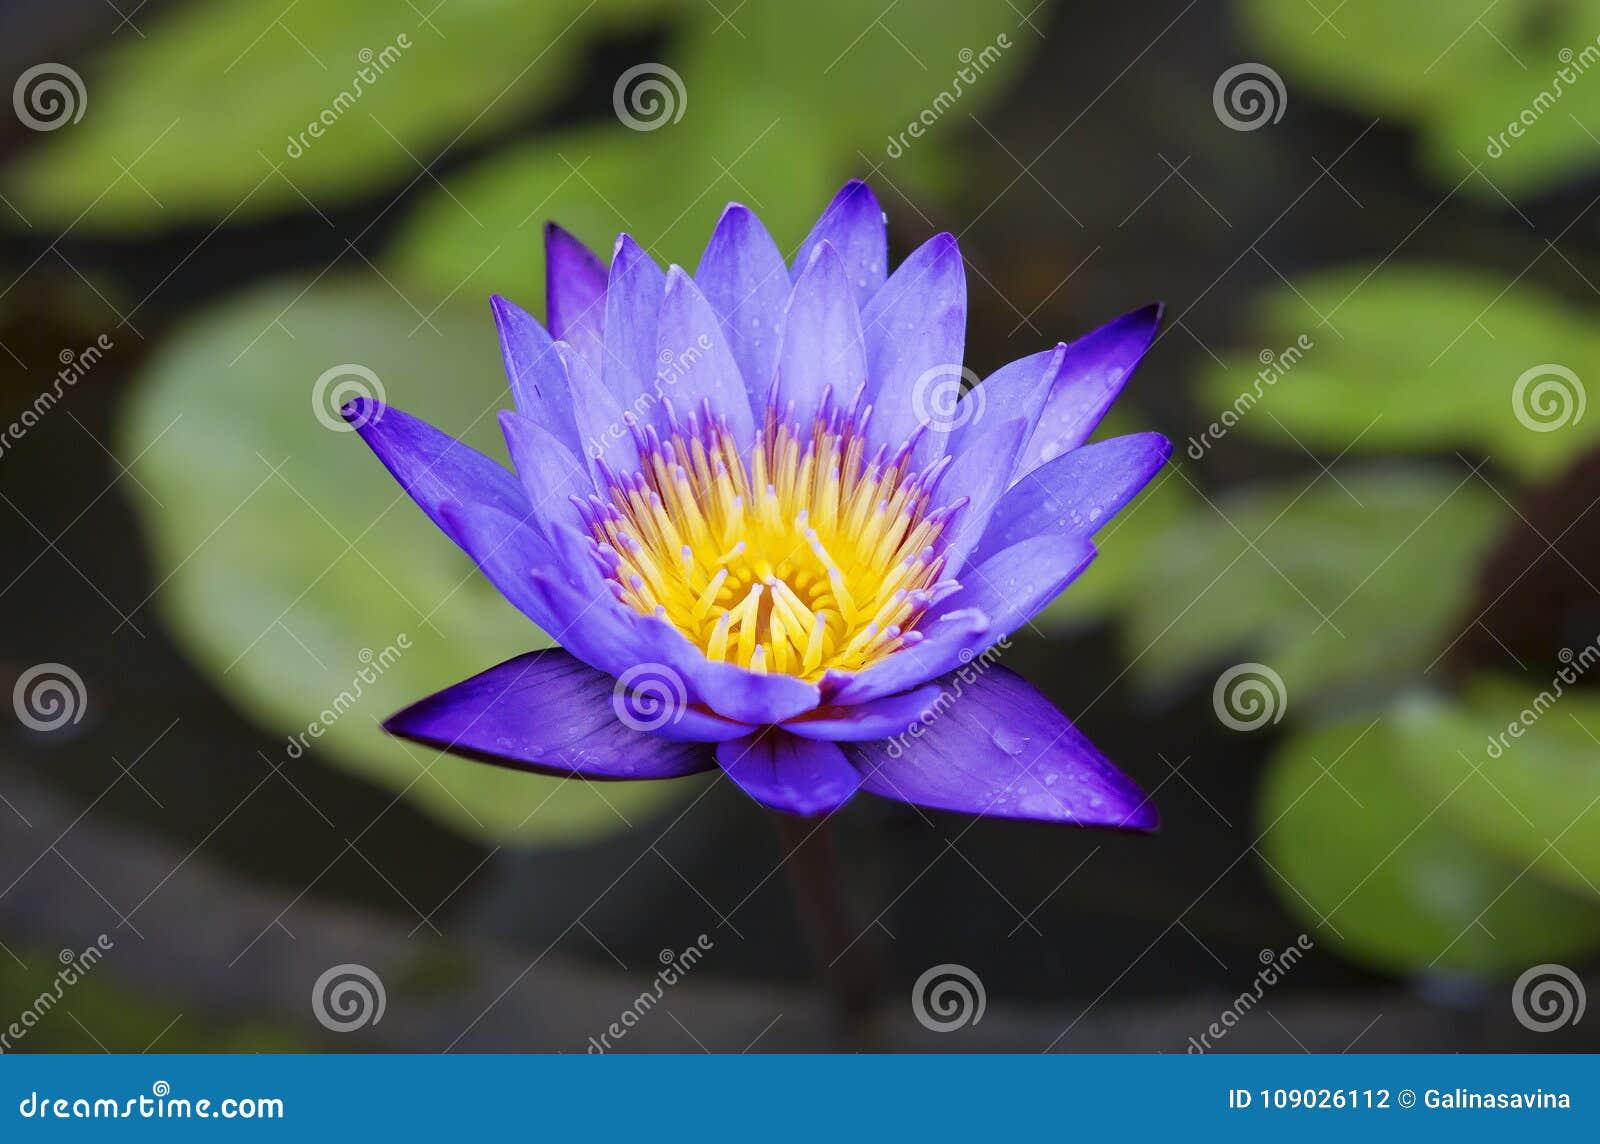 Flower Lotus Stock Photo Image Of Indonesia Leaves 109026112